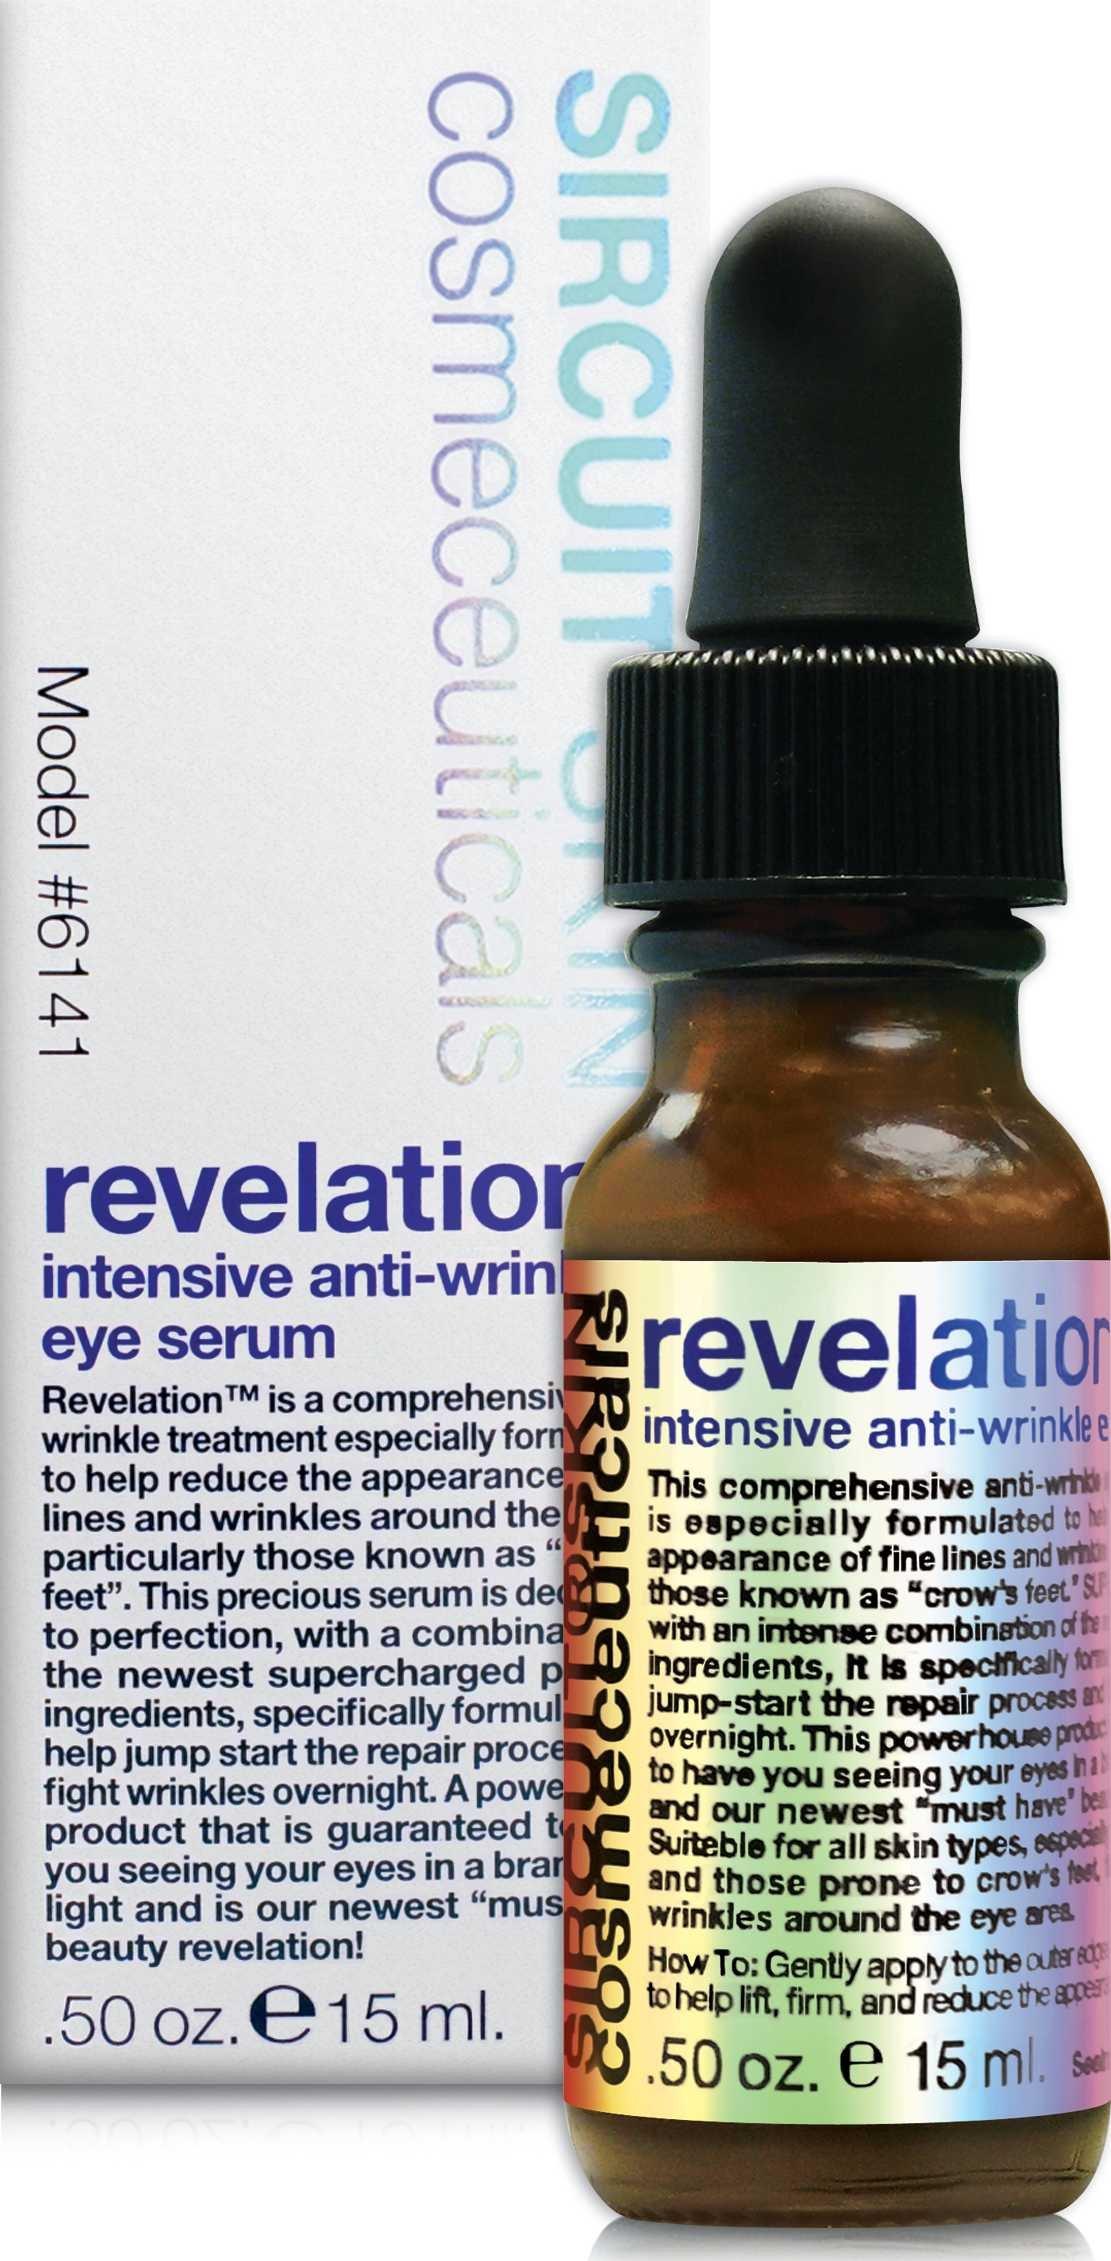 Sircuit Skin REVELATION Intensive Anti-Wrinkle Eye Serum (0.5 Ounces)